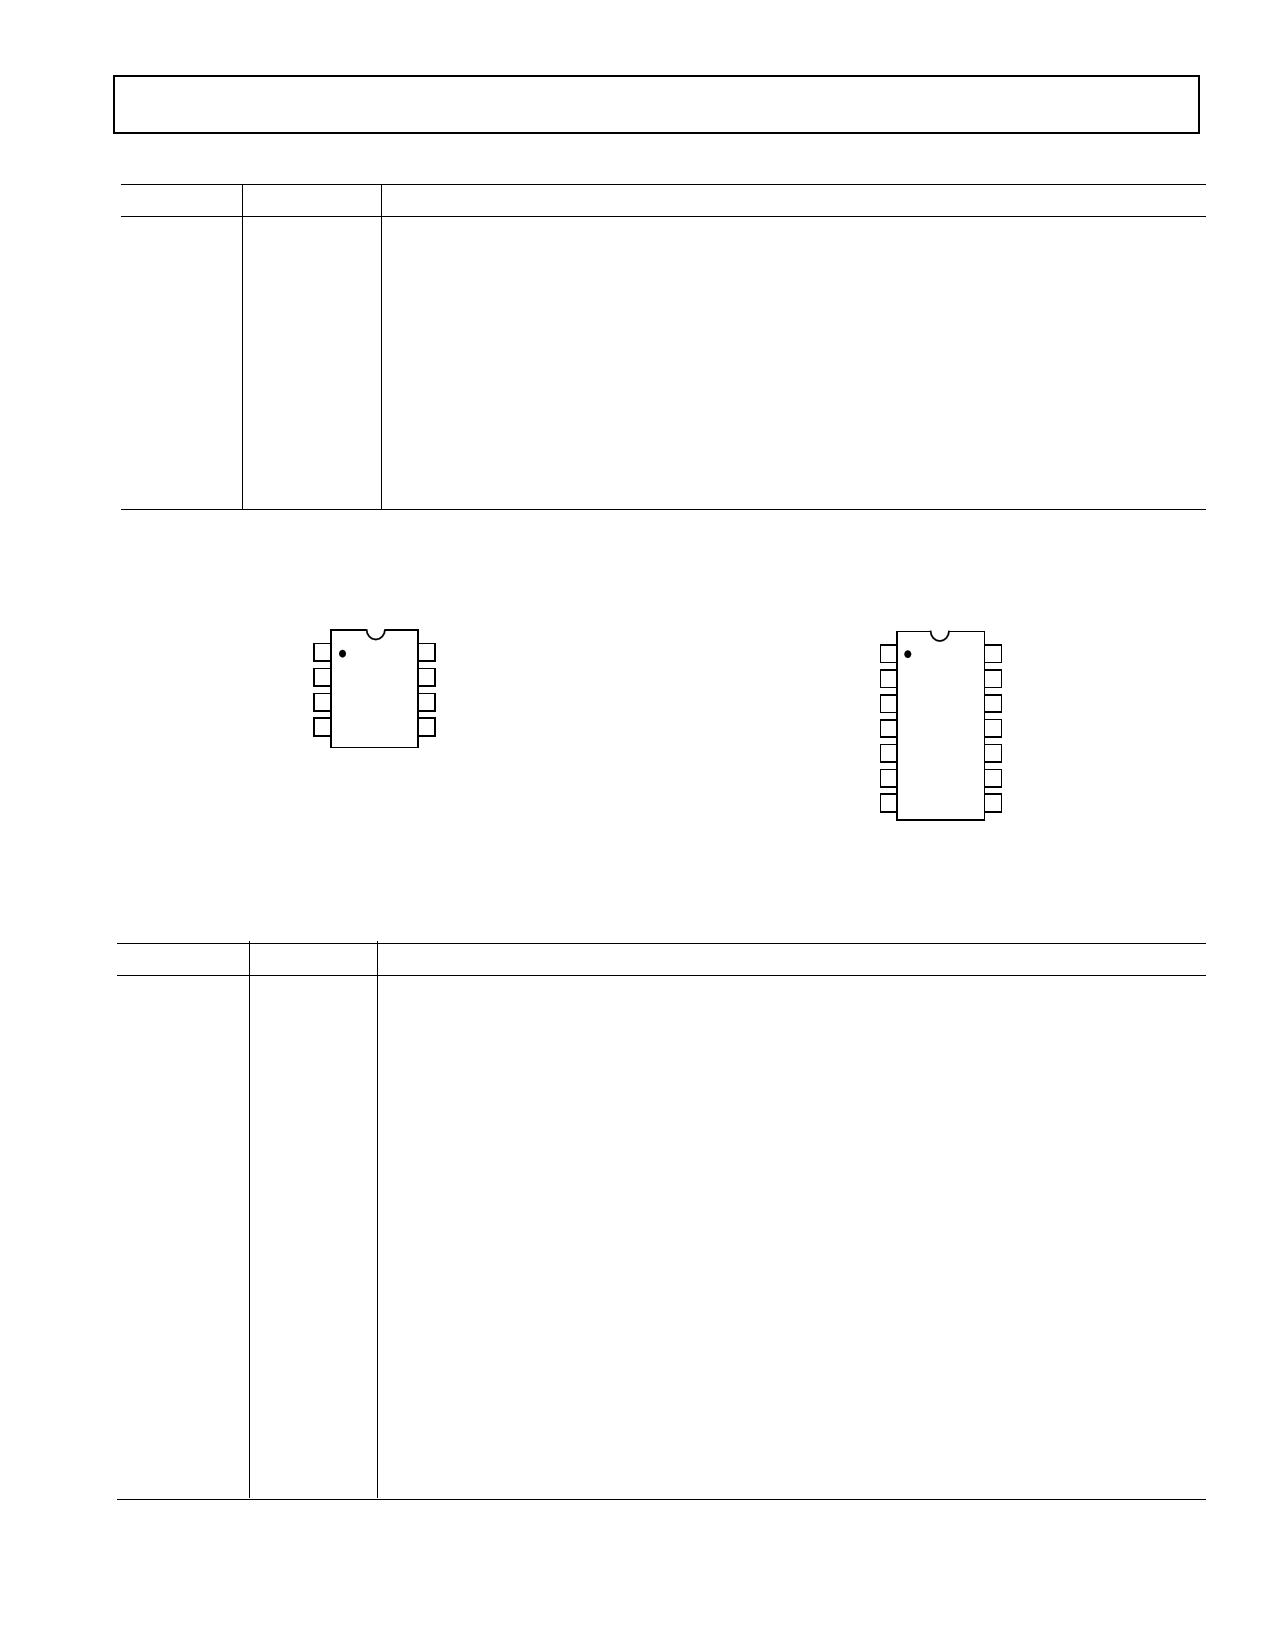 AD5542 pdf, arduino